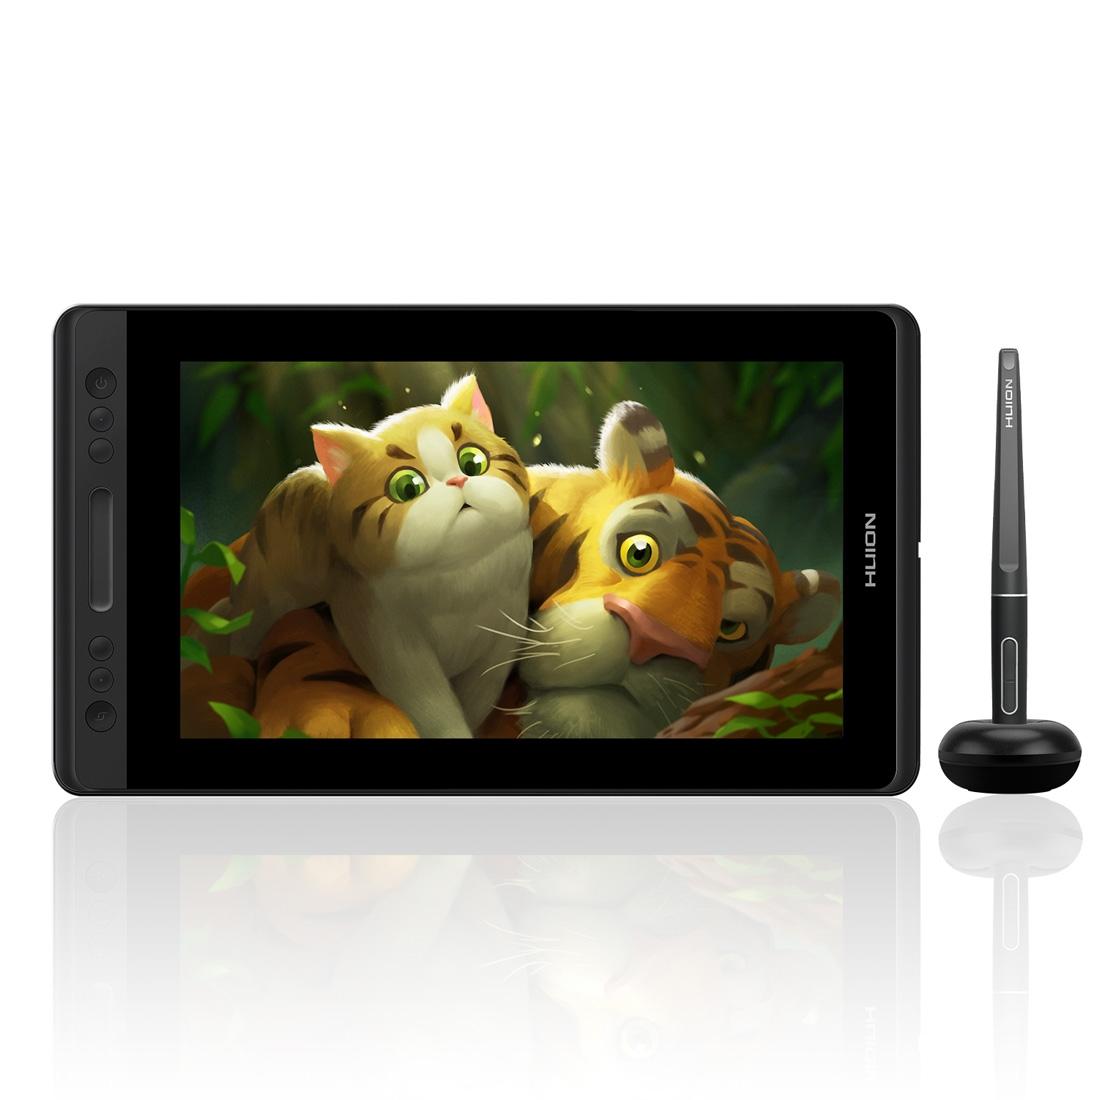 HUION Kamvas Series GT-133 13.3inch 5080LPI Graphics Drawing Tablet Digital Display for Windows / Mac OS, with Digital Pen